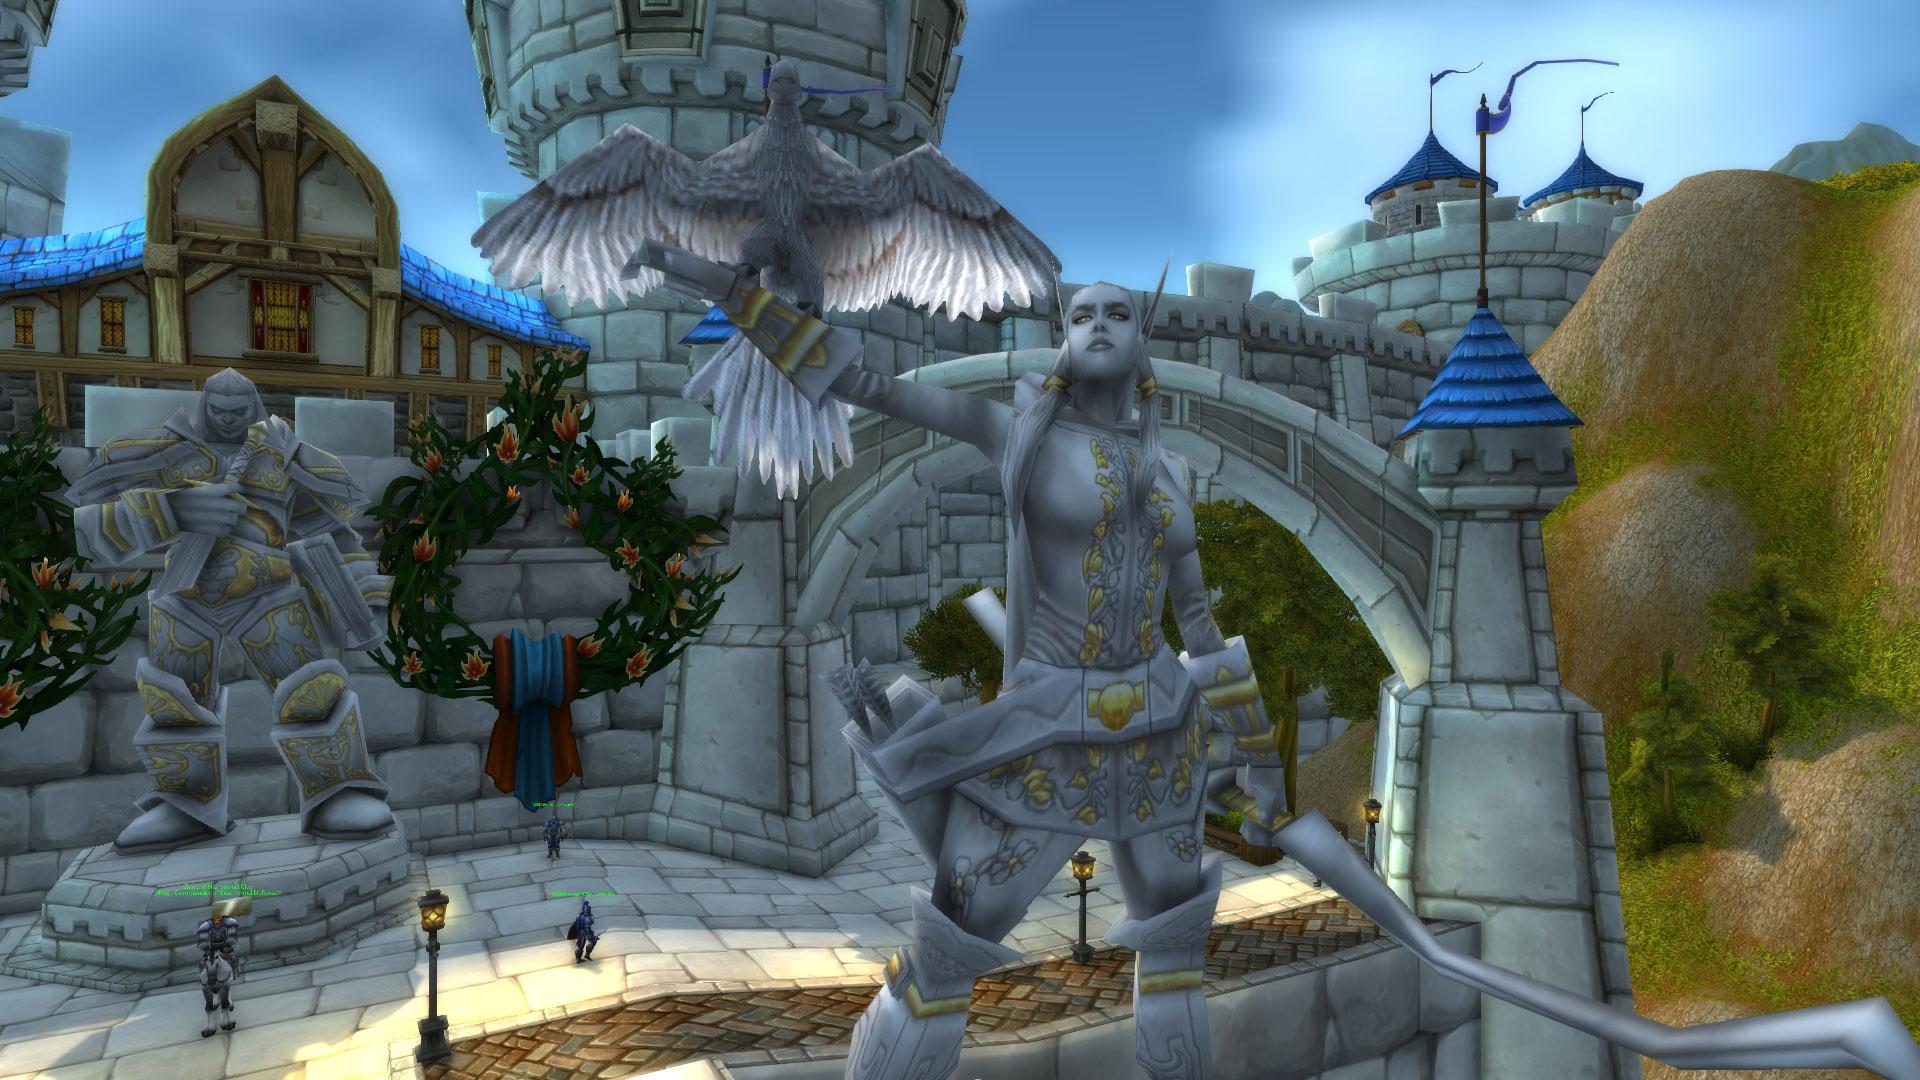 WoW Alleria Statue Stormwind